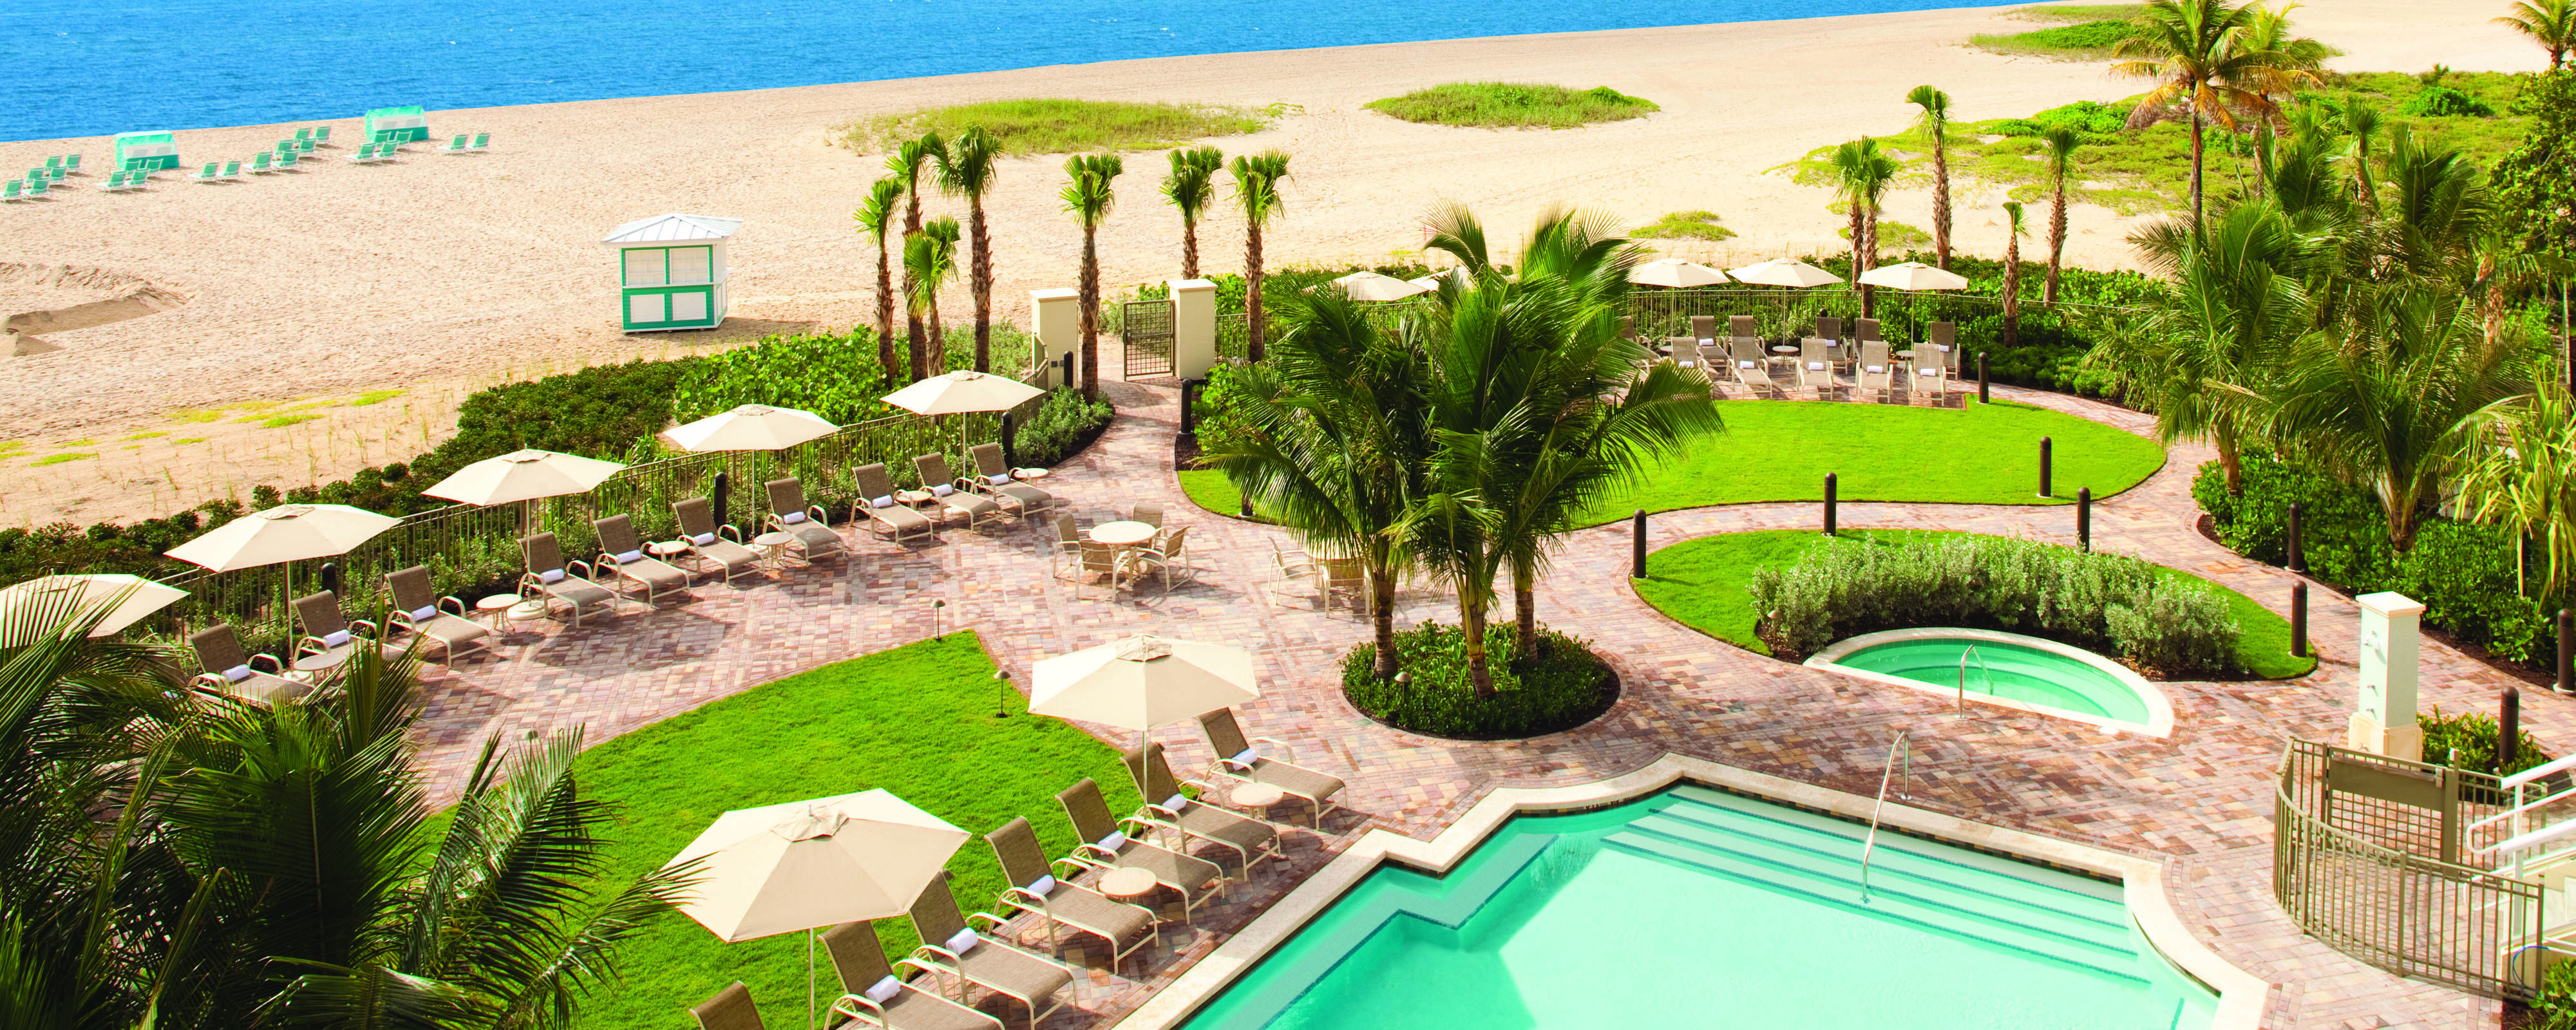 Marriott Hotel In Fort Lauderdale - Hotel Near Me